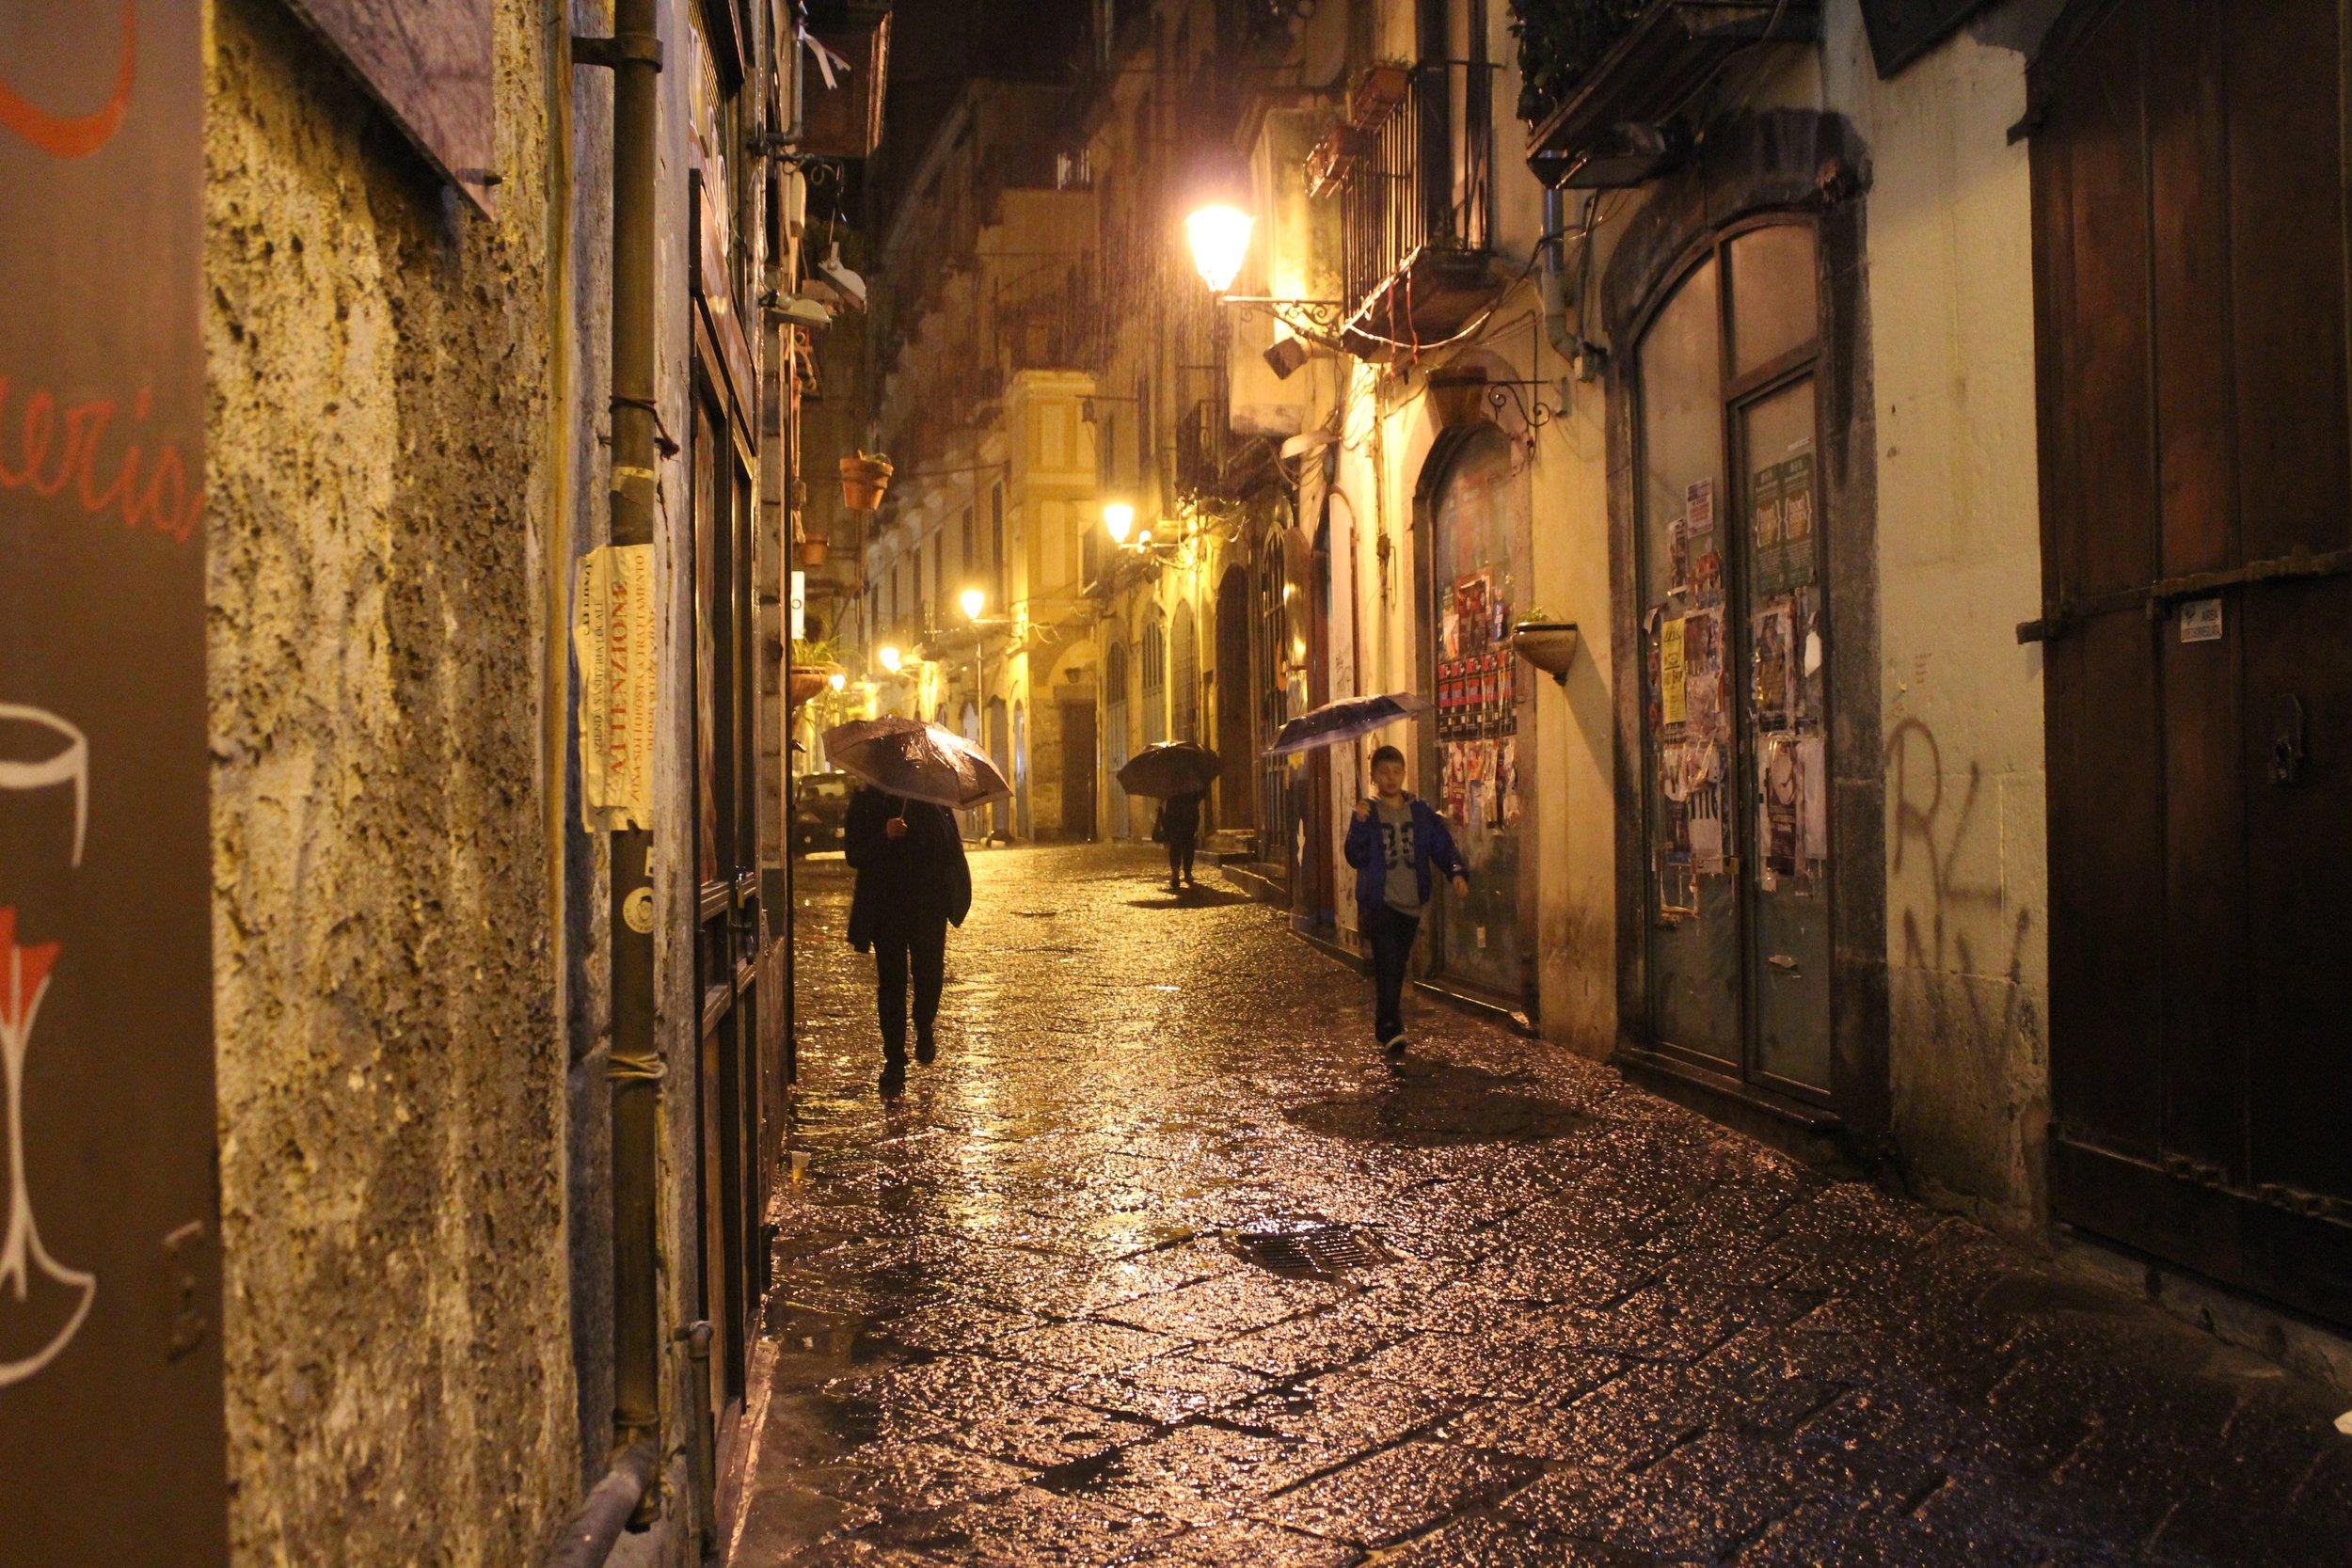 Salerno's historic center on a rainy night.